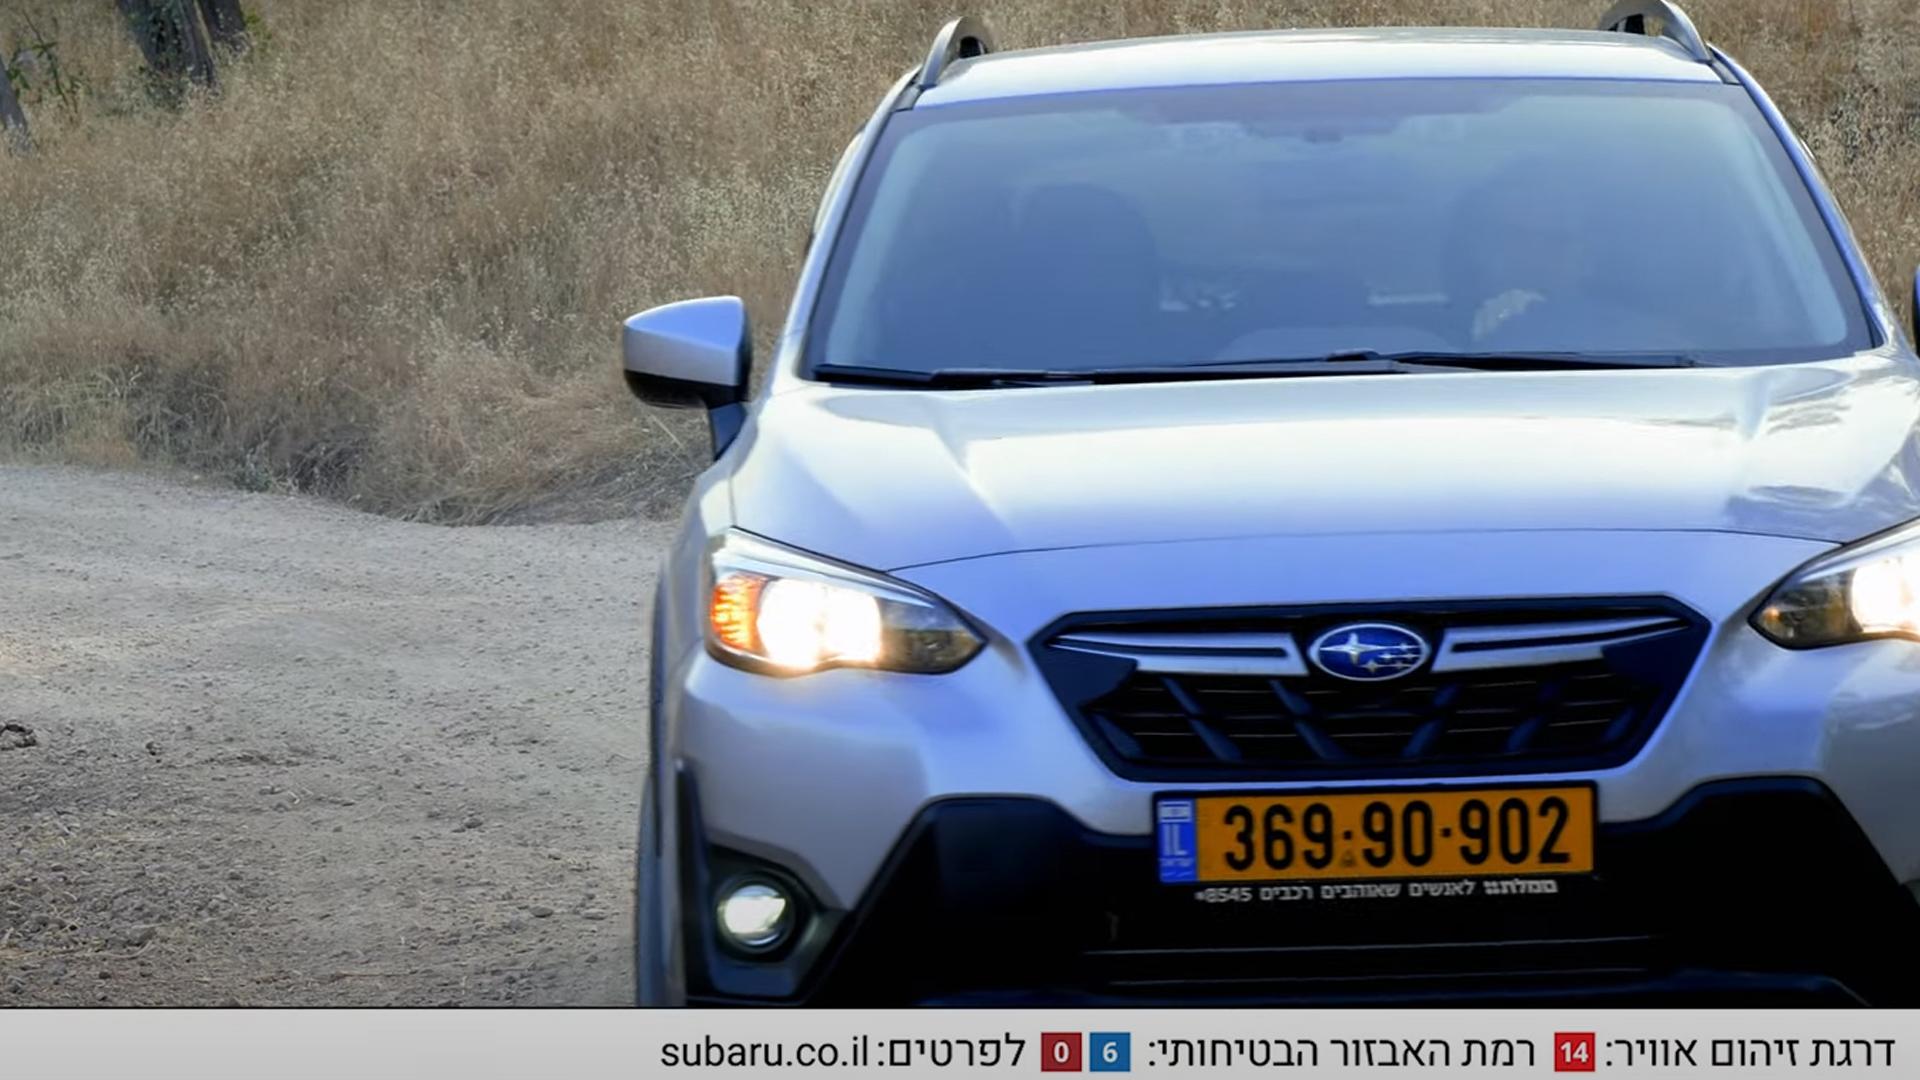 Digital Notion - Subaru